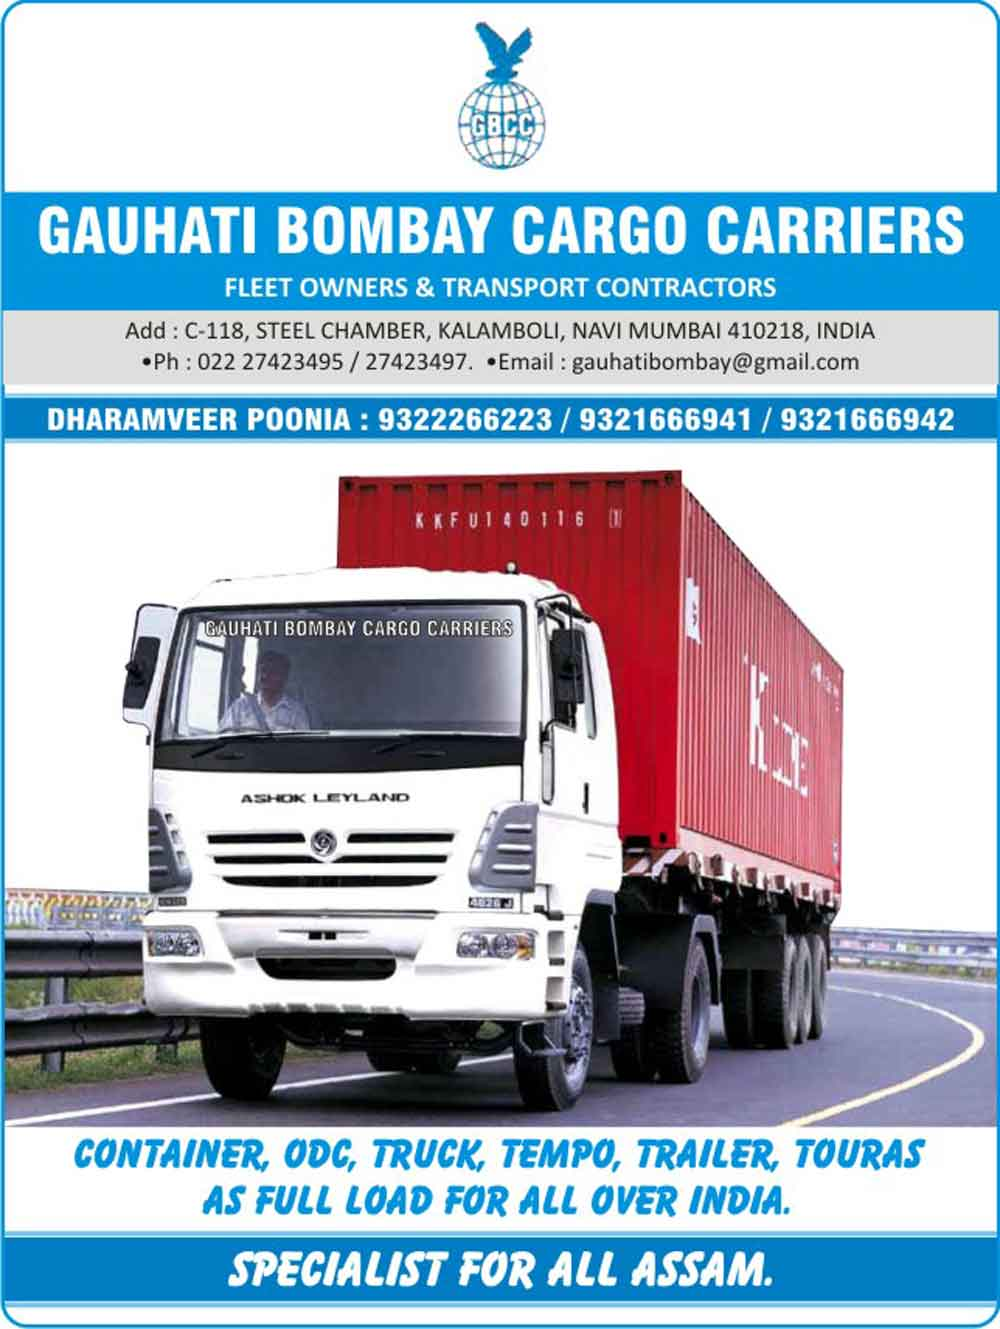 Gauhati Bombay Cargo Carriers